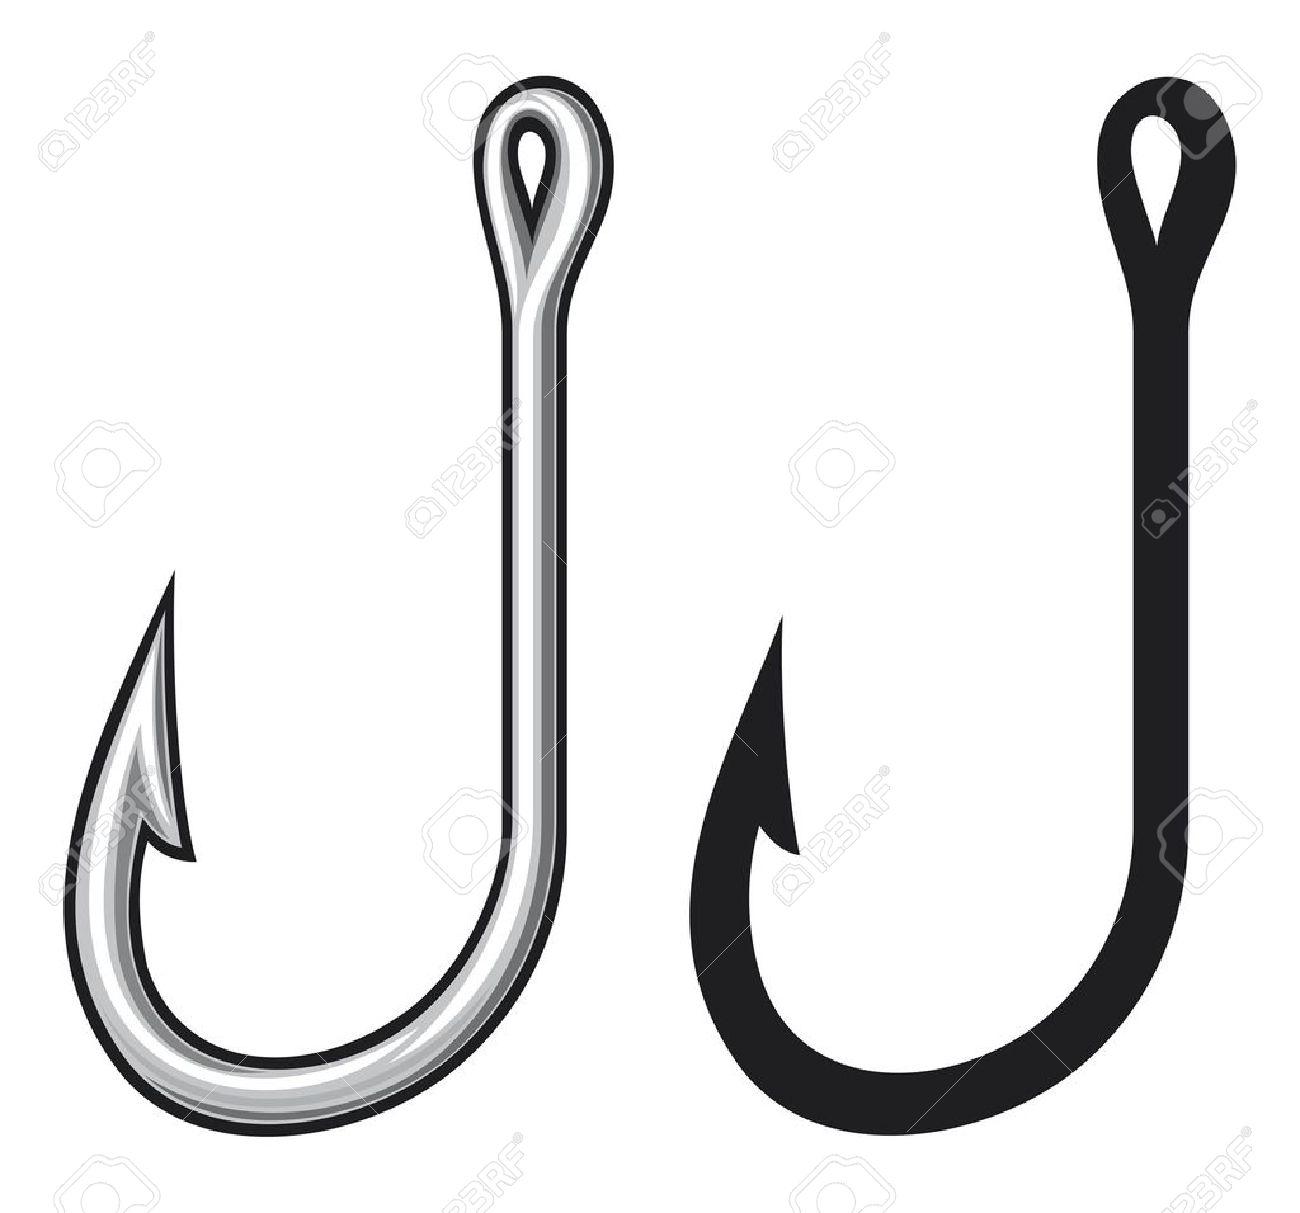 Fish hook clip art.